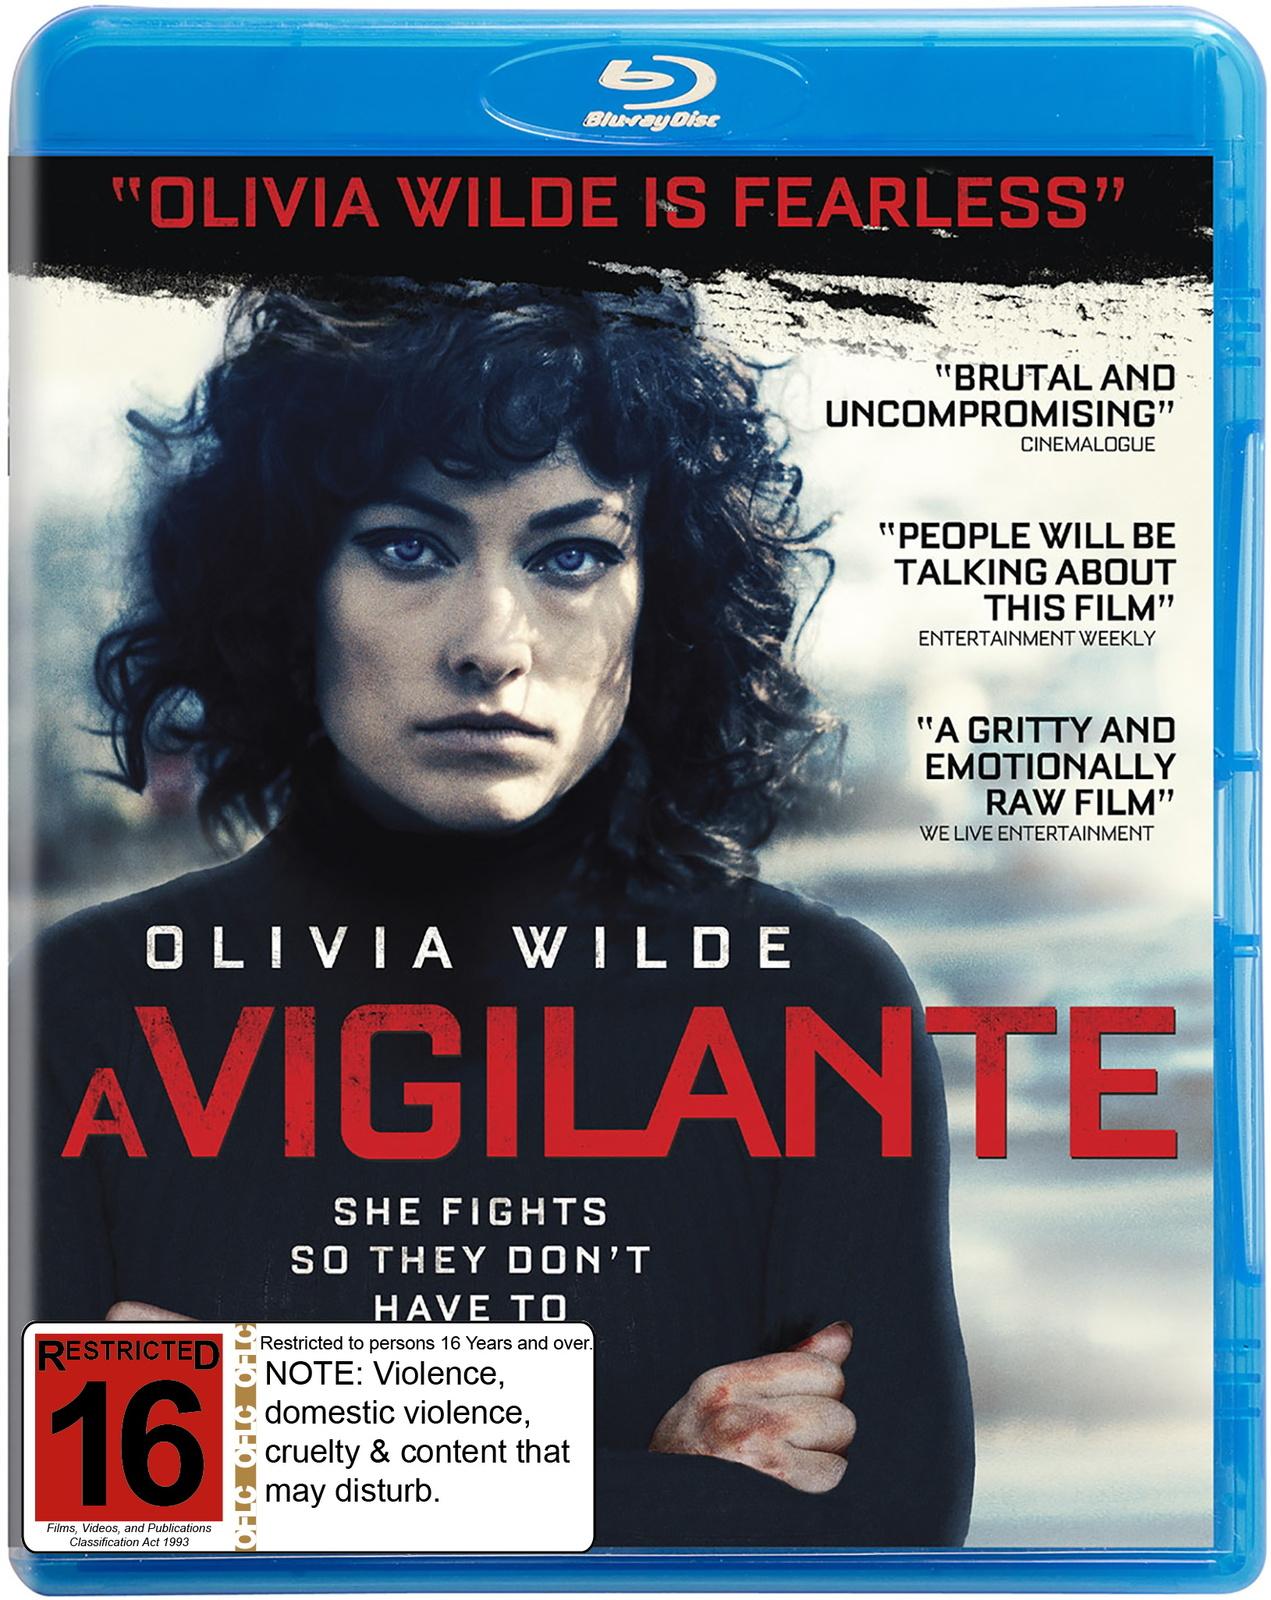 A Vigilante on Blu-ray image